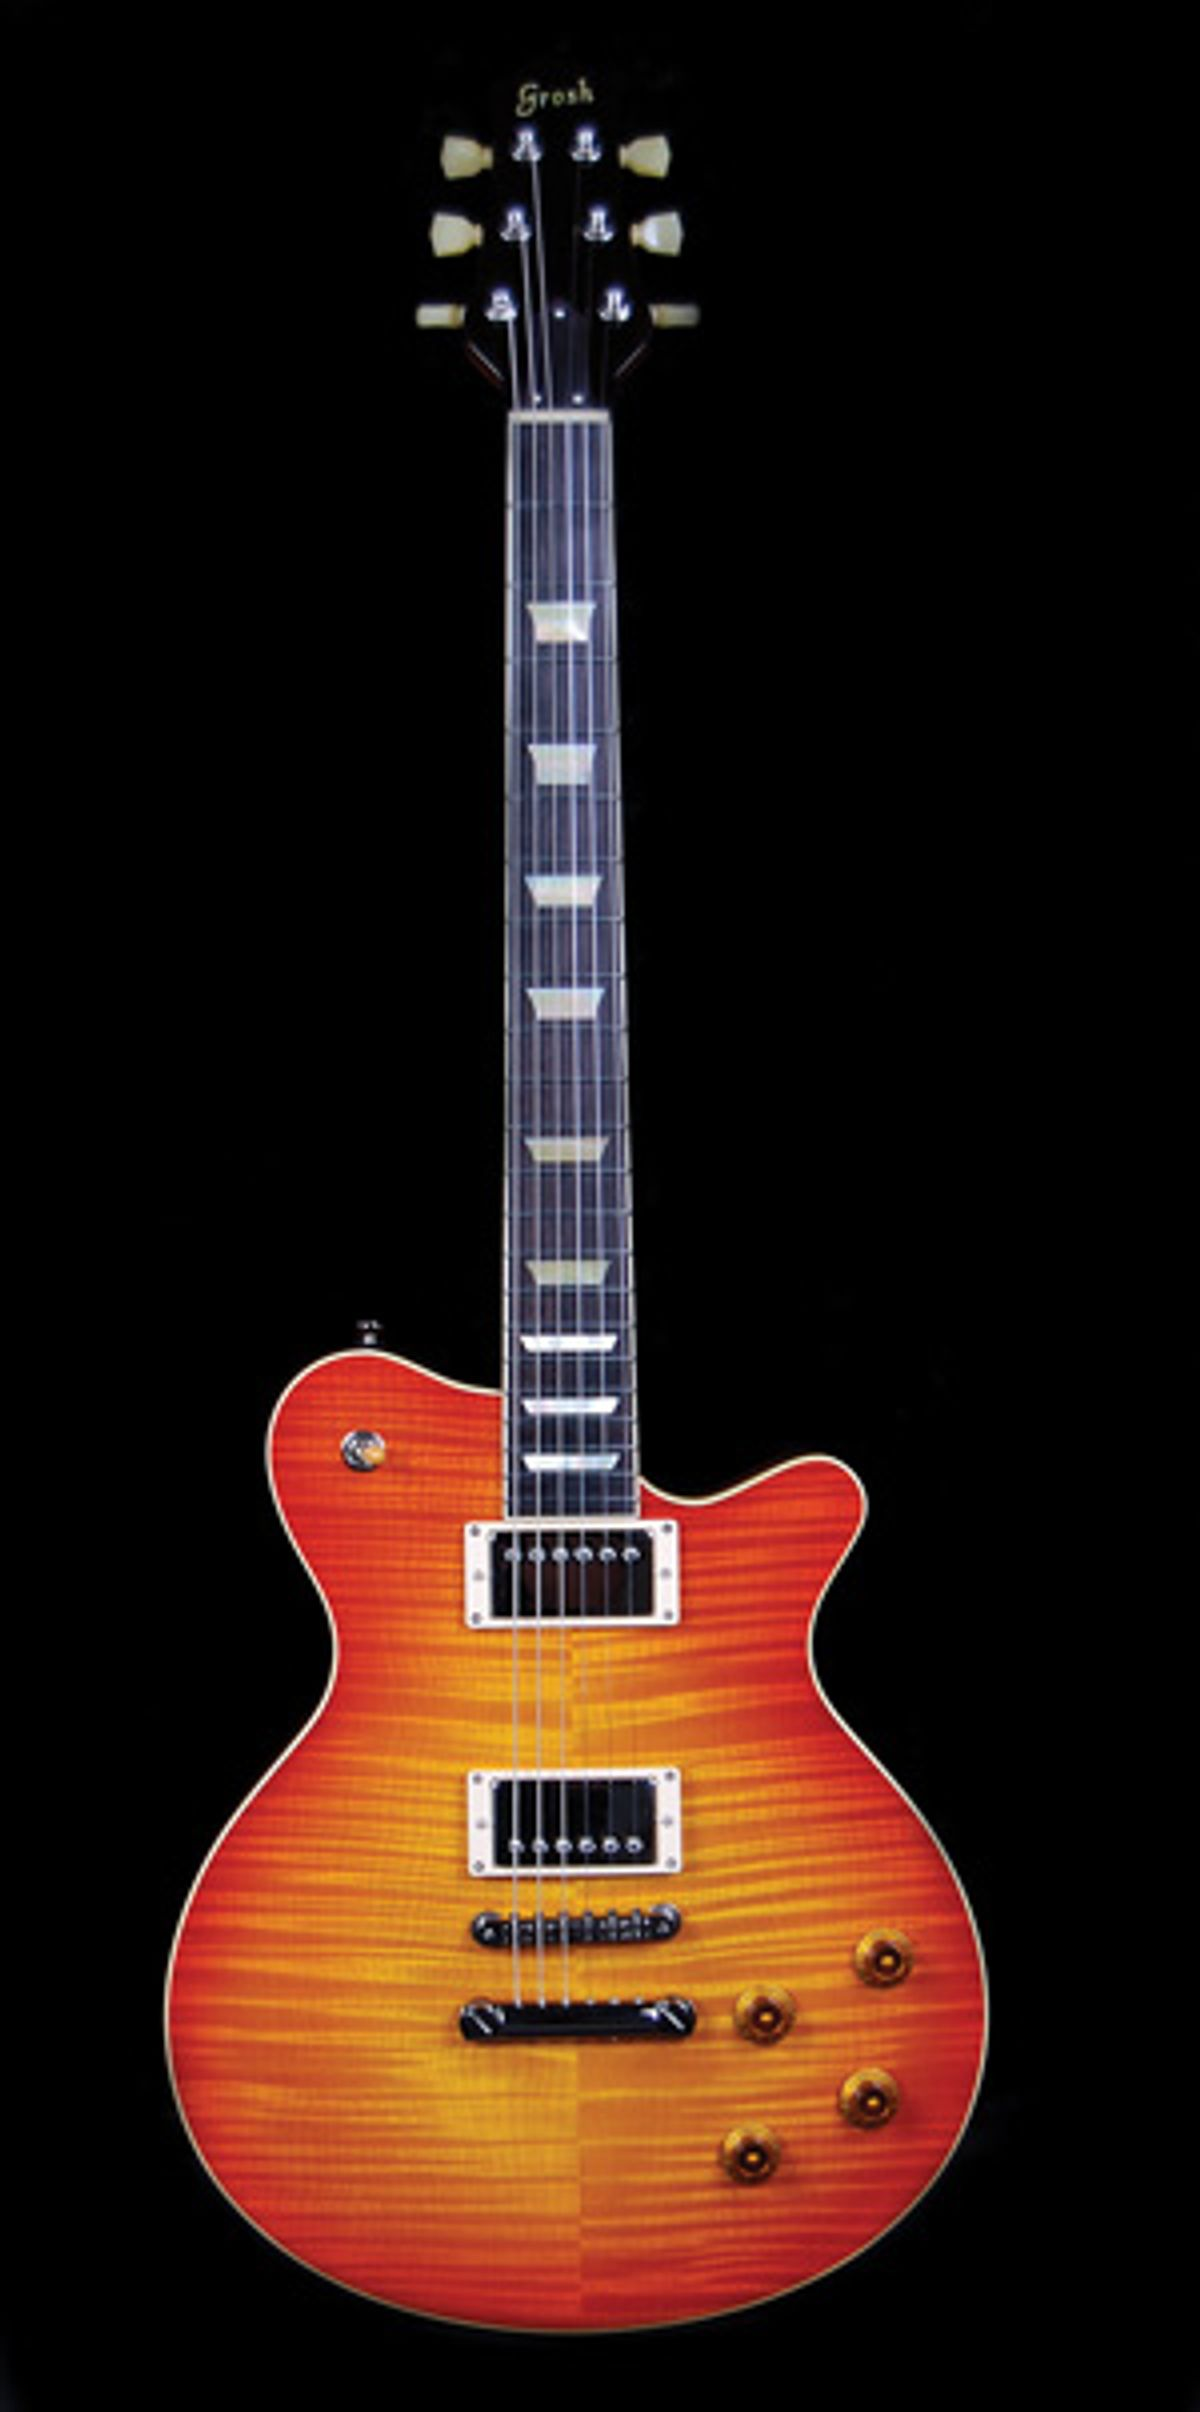 Grosh Guitars '59 Spec Set Neck Model